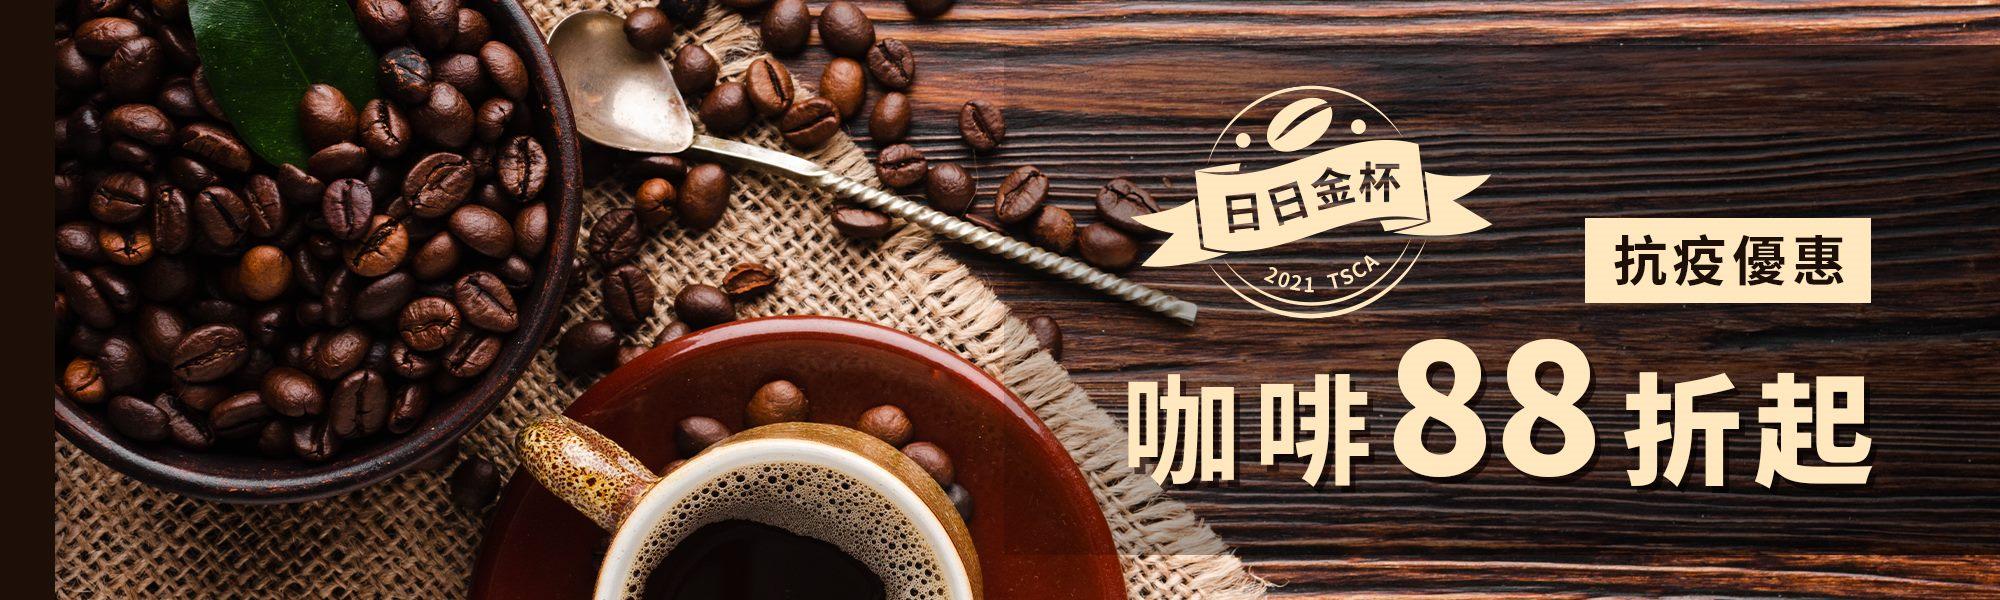 2021 TSCA 日日金杯 抗疫優惠咖啡88折起